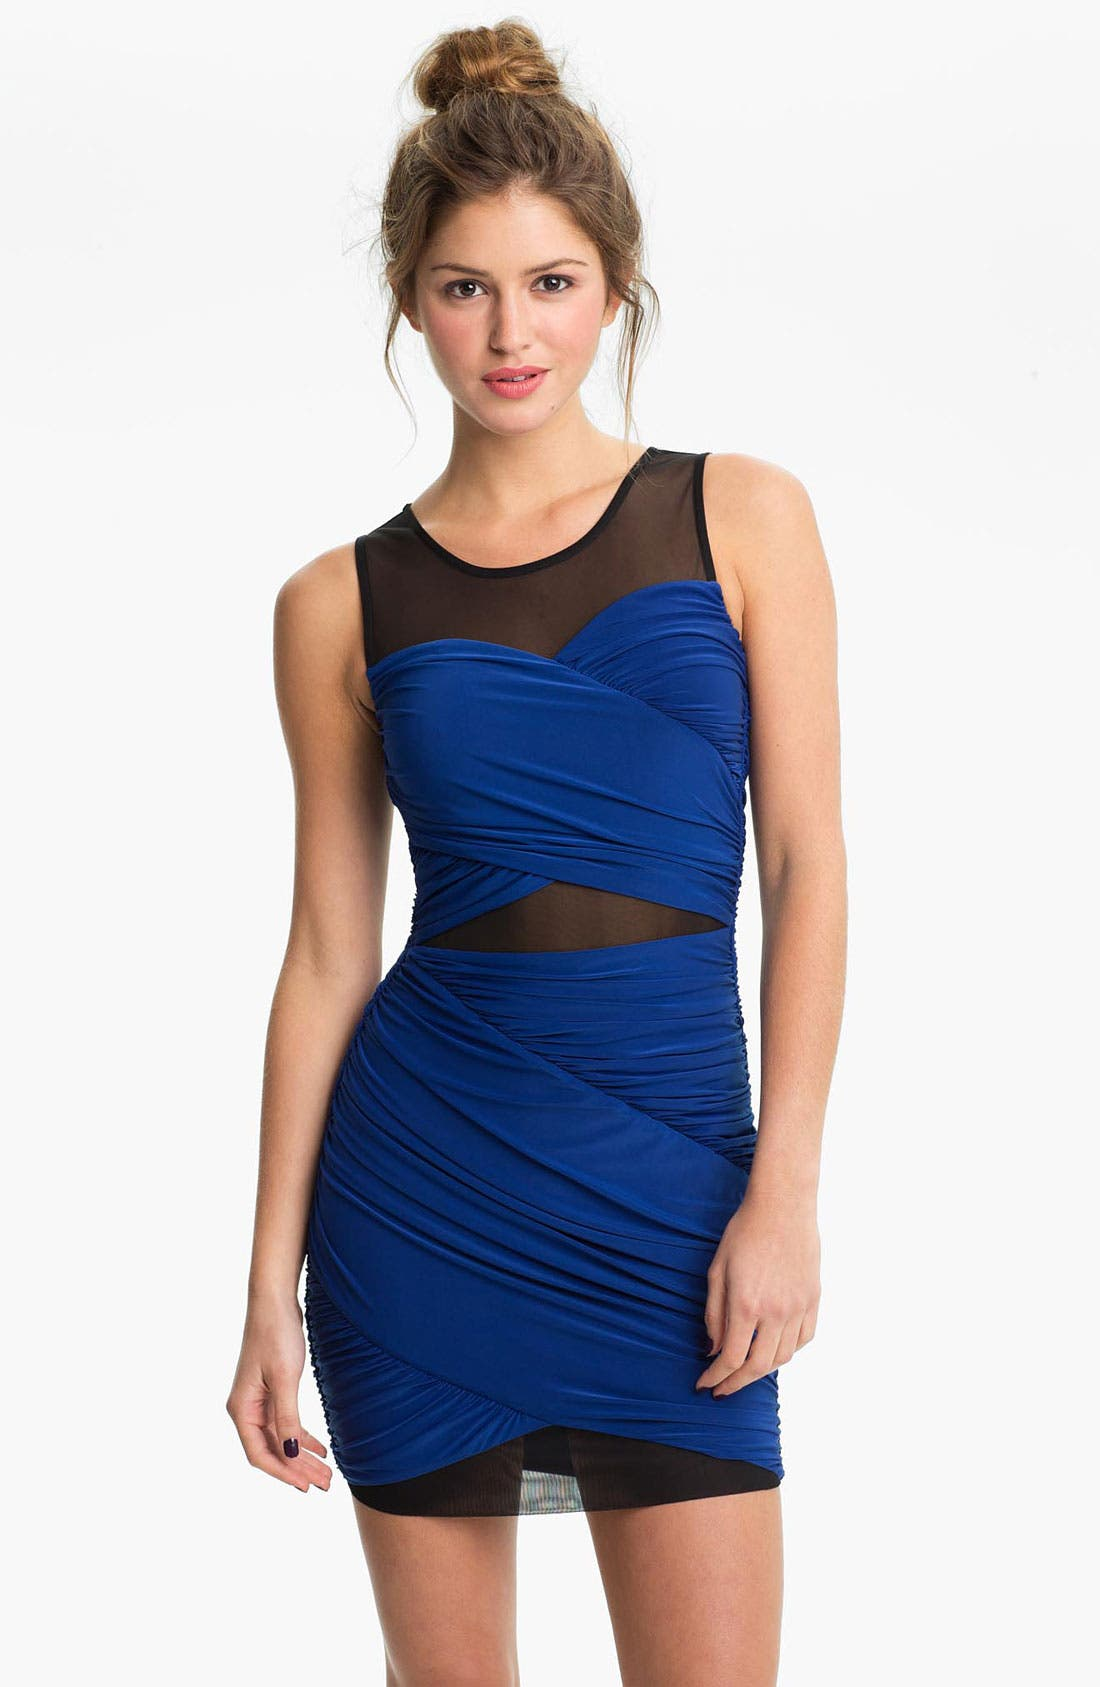 Alternate Image 1 Selected - Soprano Mesh Panel Draped Body-Con Dress (Juniors)